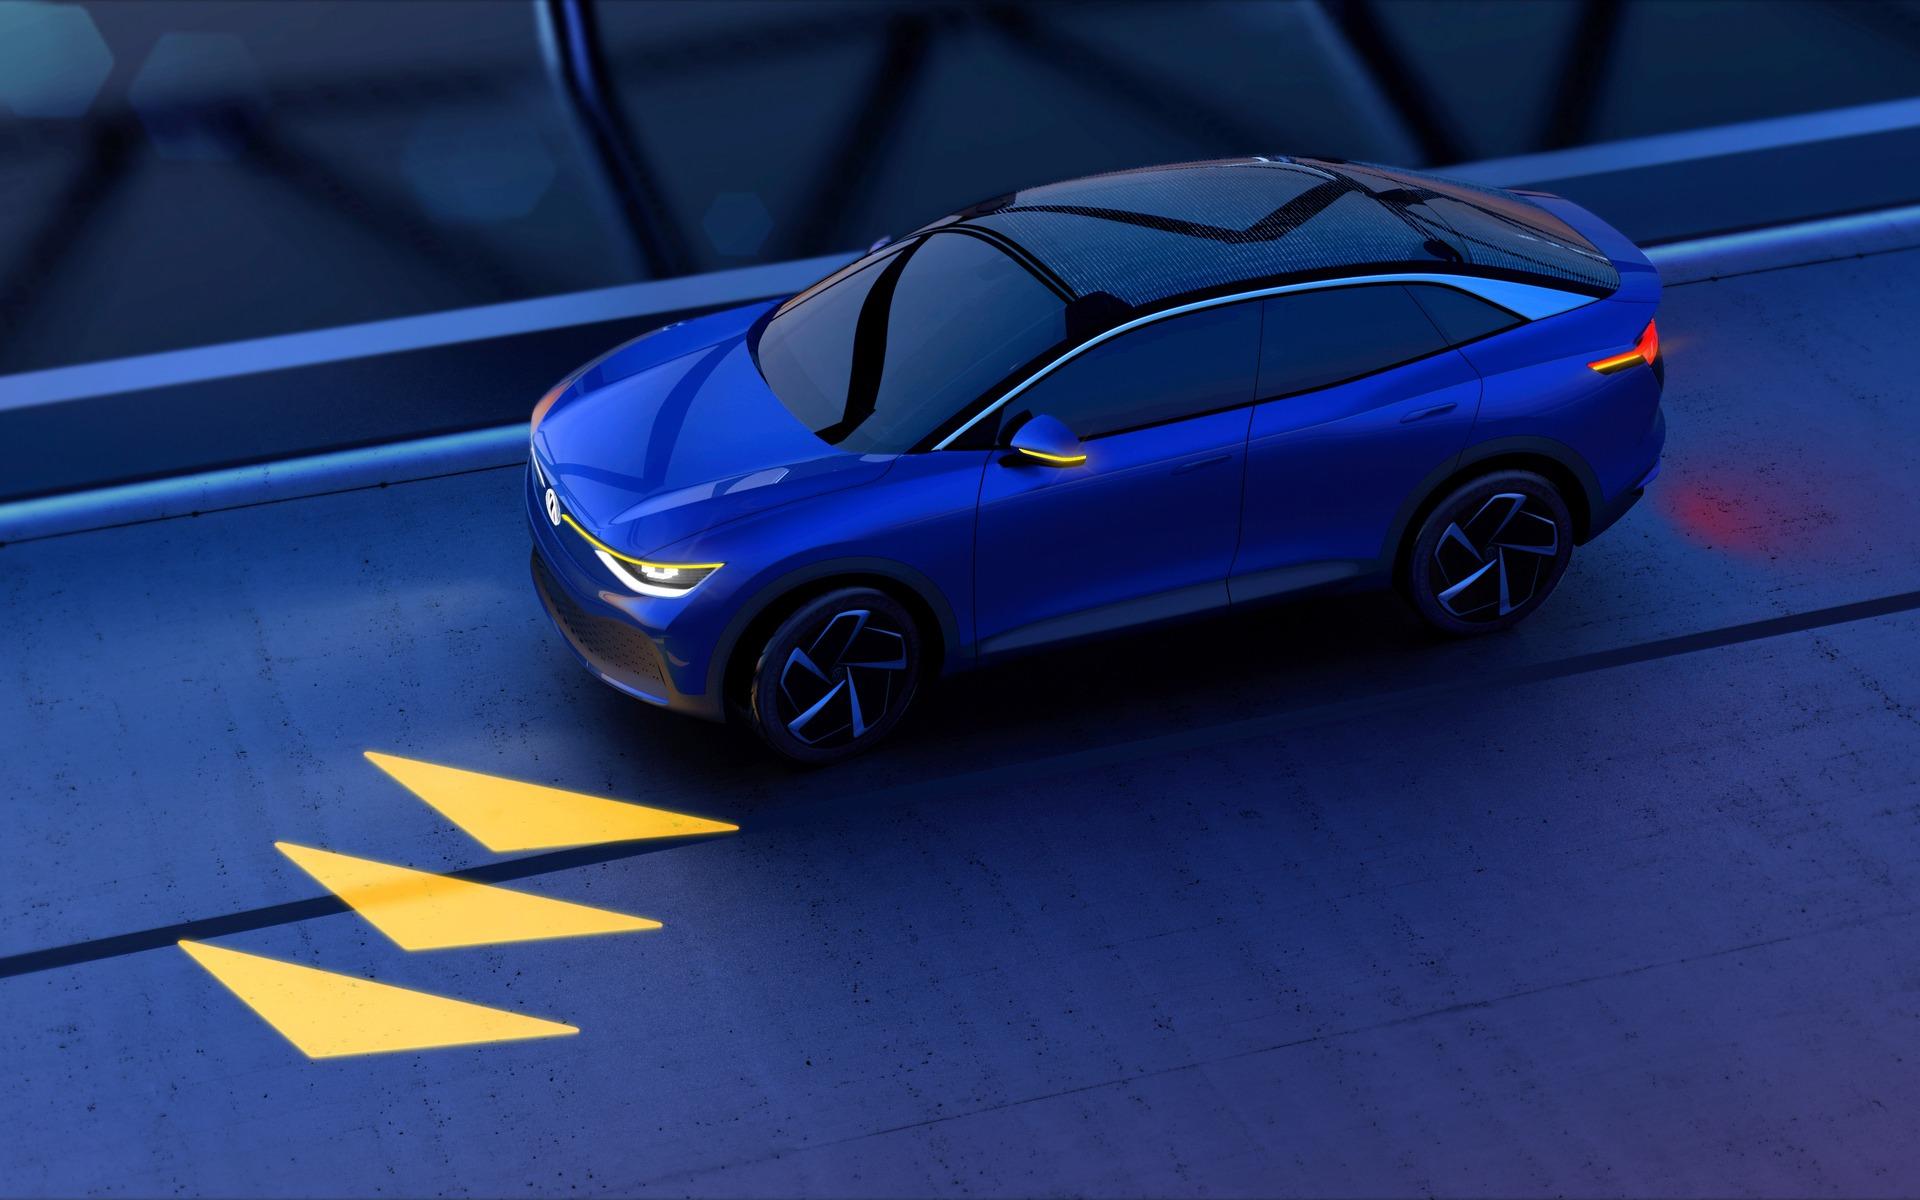 Volkswagen's future looks bright